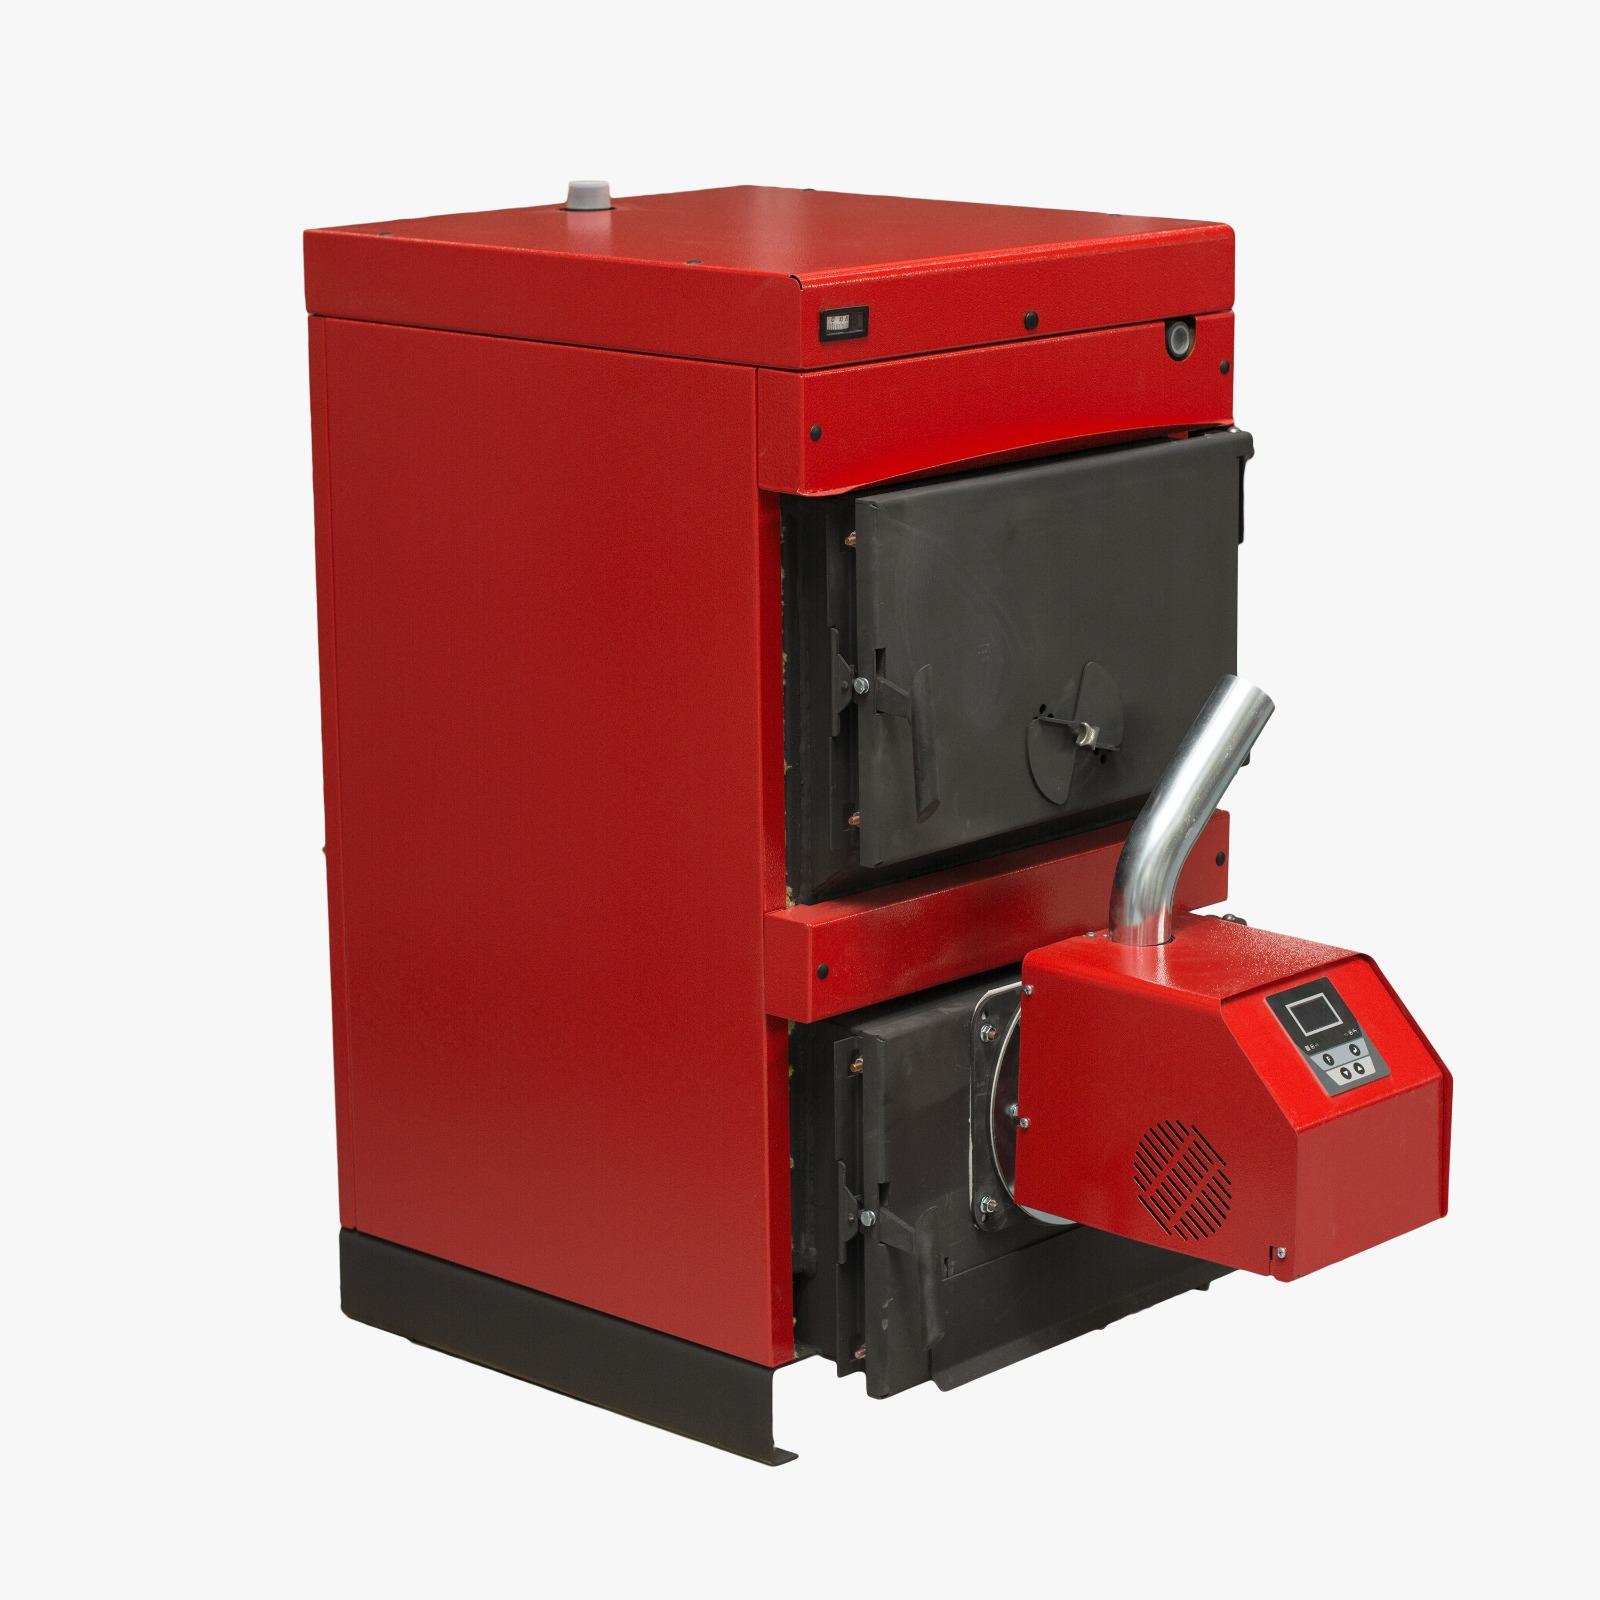 Pachet centrala mixta lemn si peleti Sunsystem Burnit WBS 20 KW cu arzator Peleti Pell Eco 25 kw, snec, aprindere automata imagine fornello.ro